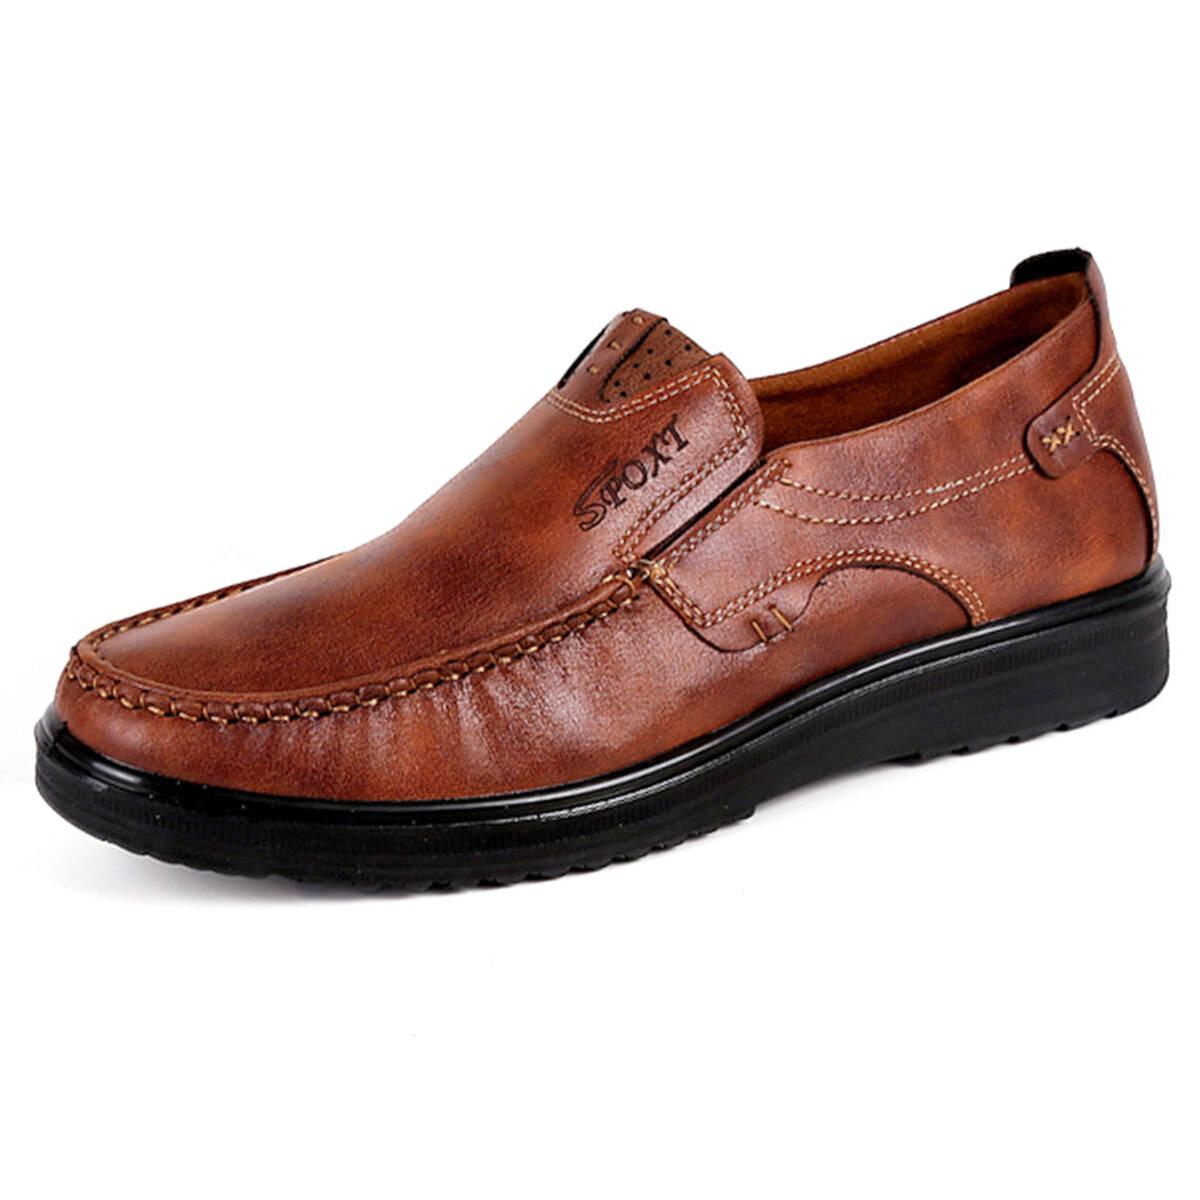 Menico Large Size Men Comfy Casual Microfiber Leather Oxfords Shoes